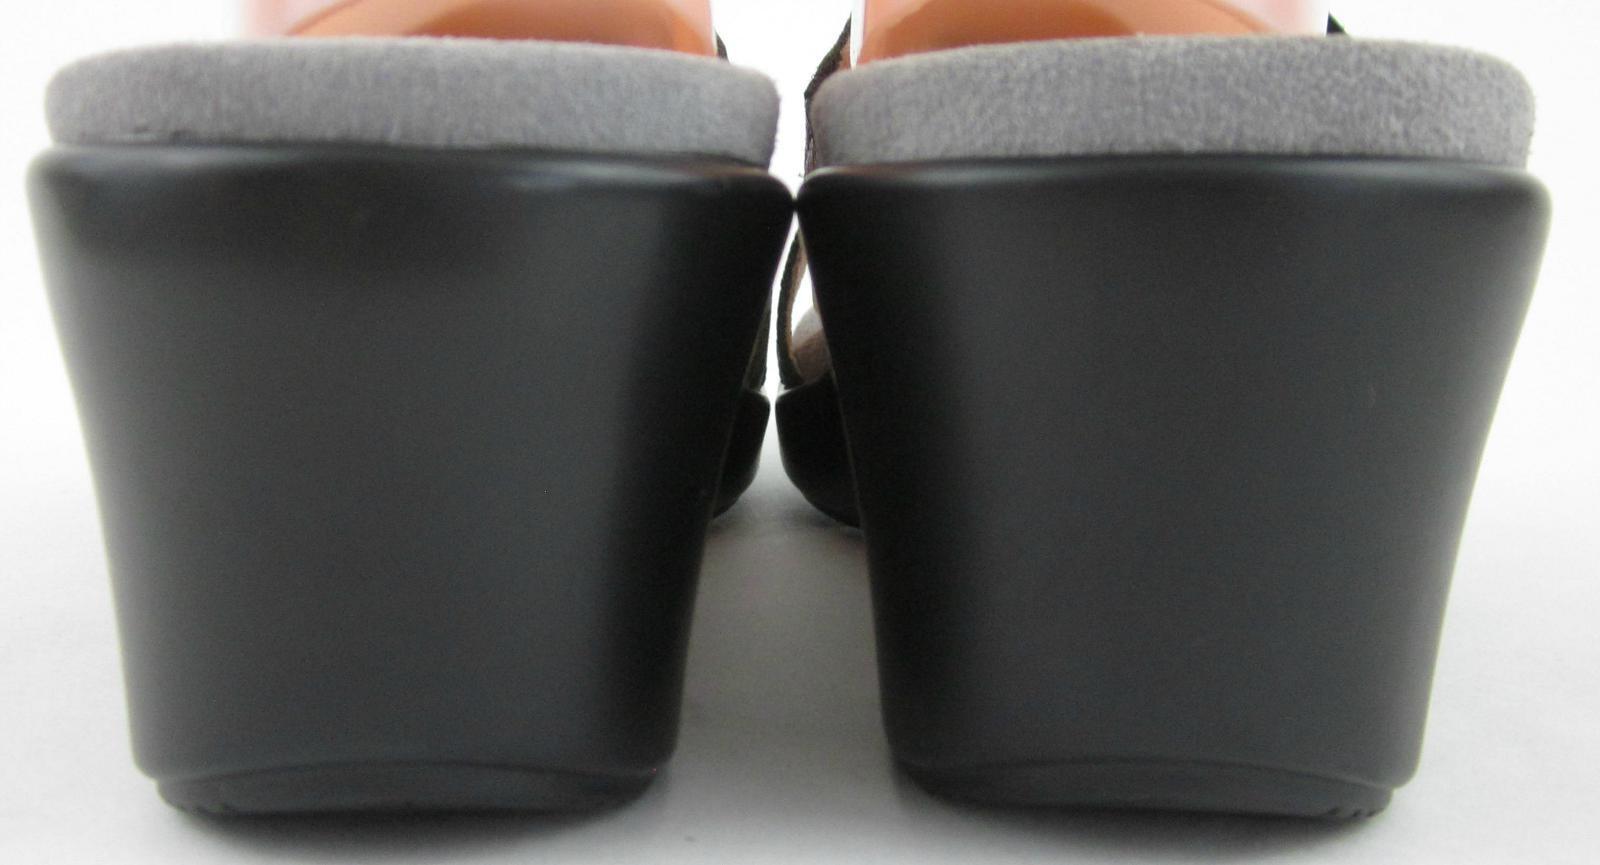 Alegria Alegria Alegria 'HULA' Floral Thong Sandals Black EU 39   US 9 Worn Once  9d86df